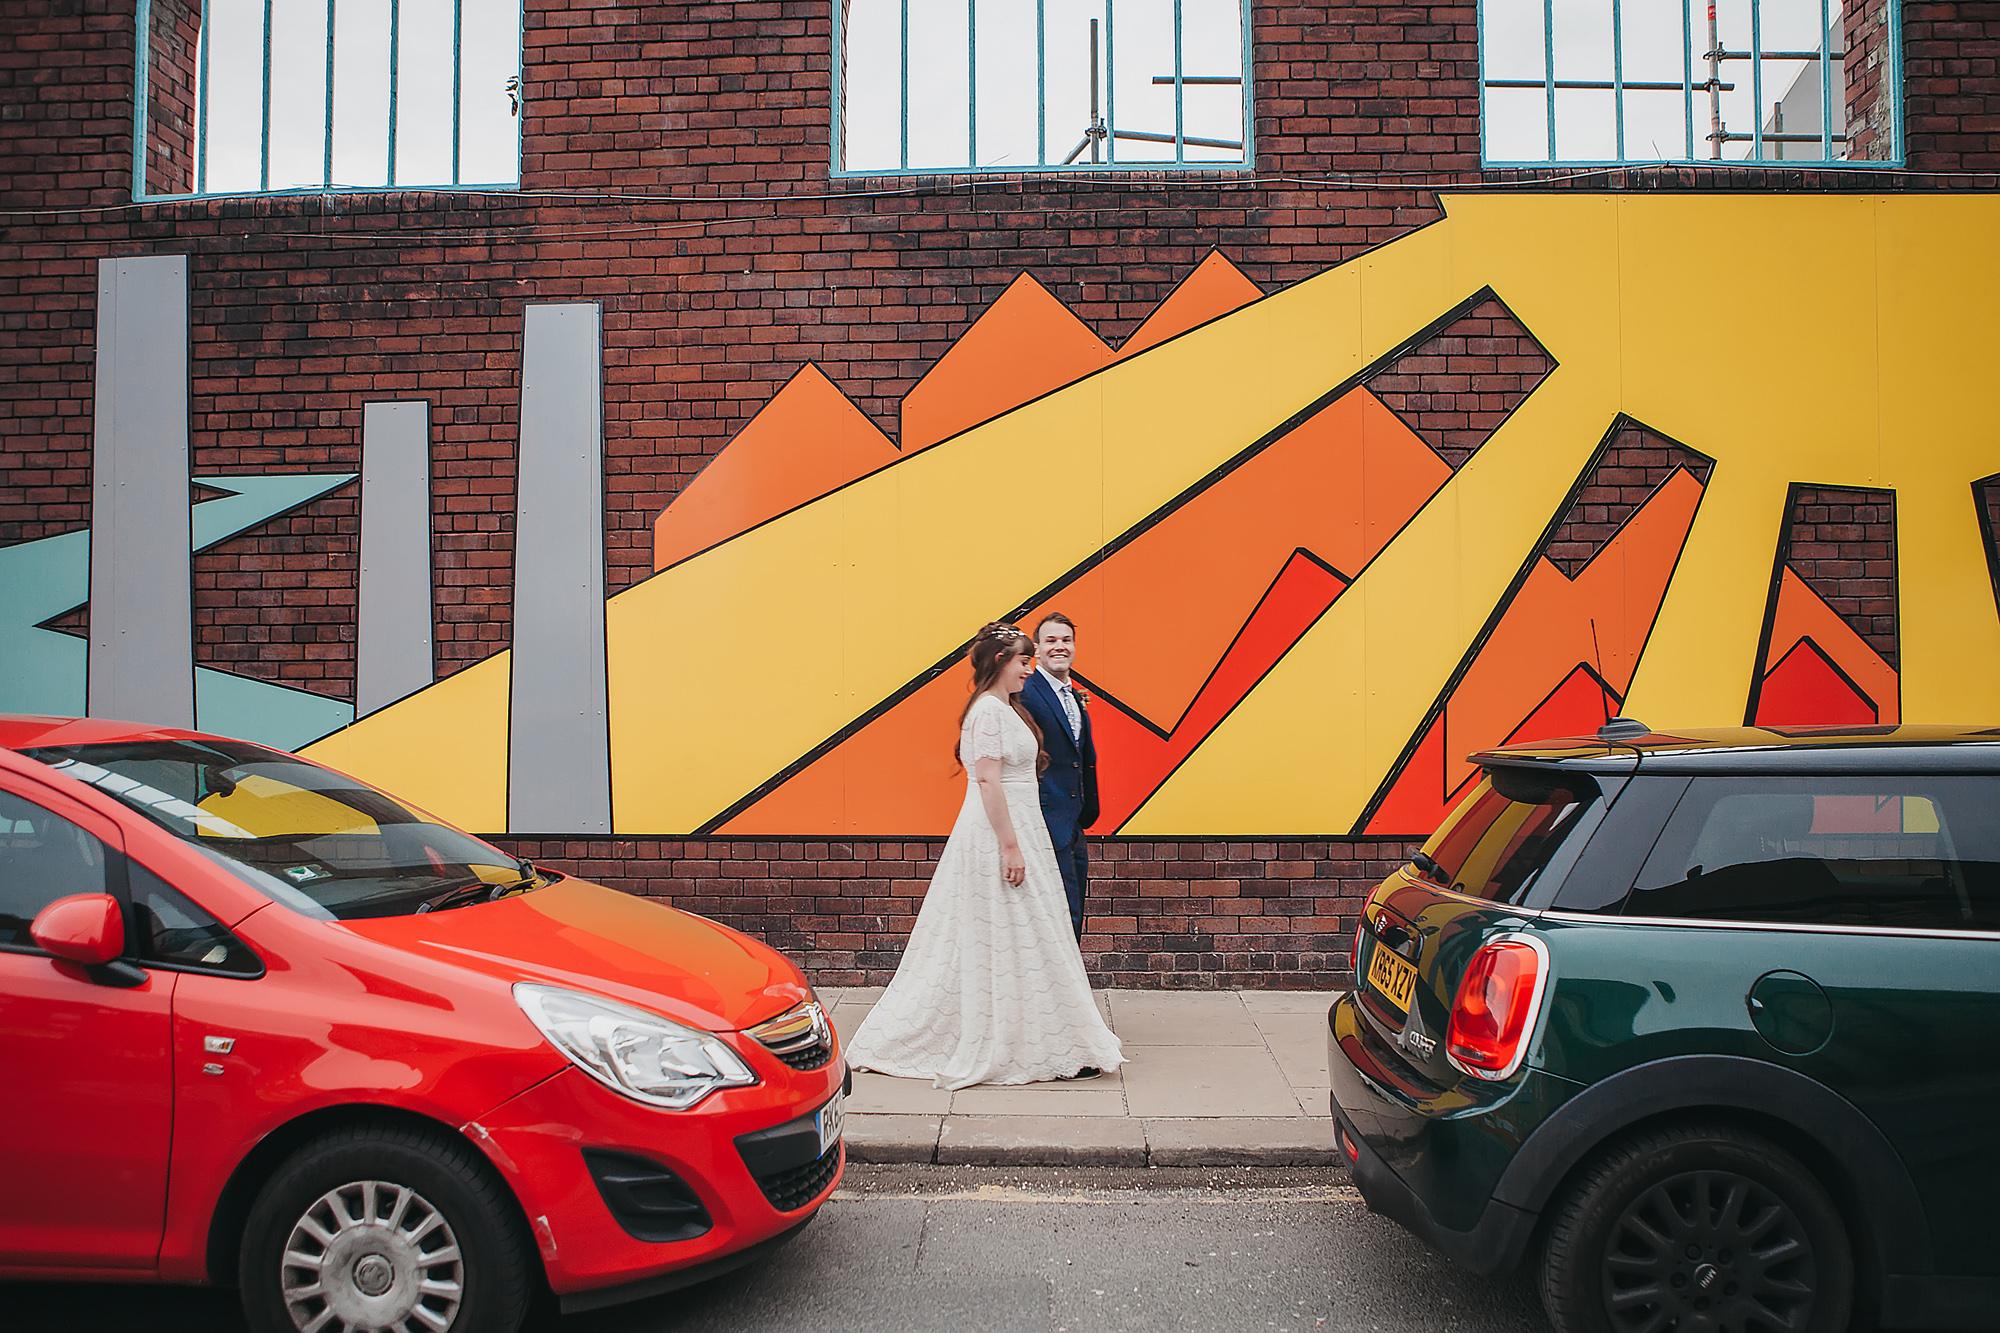 Kristy-Back-Garden-Outdoor-Wedding-Sheffield-Industrial-Warehouse-Wedding-Bohemian-Kate-Beaumont-Dahlia-Dress-48.jpg